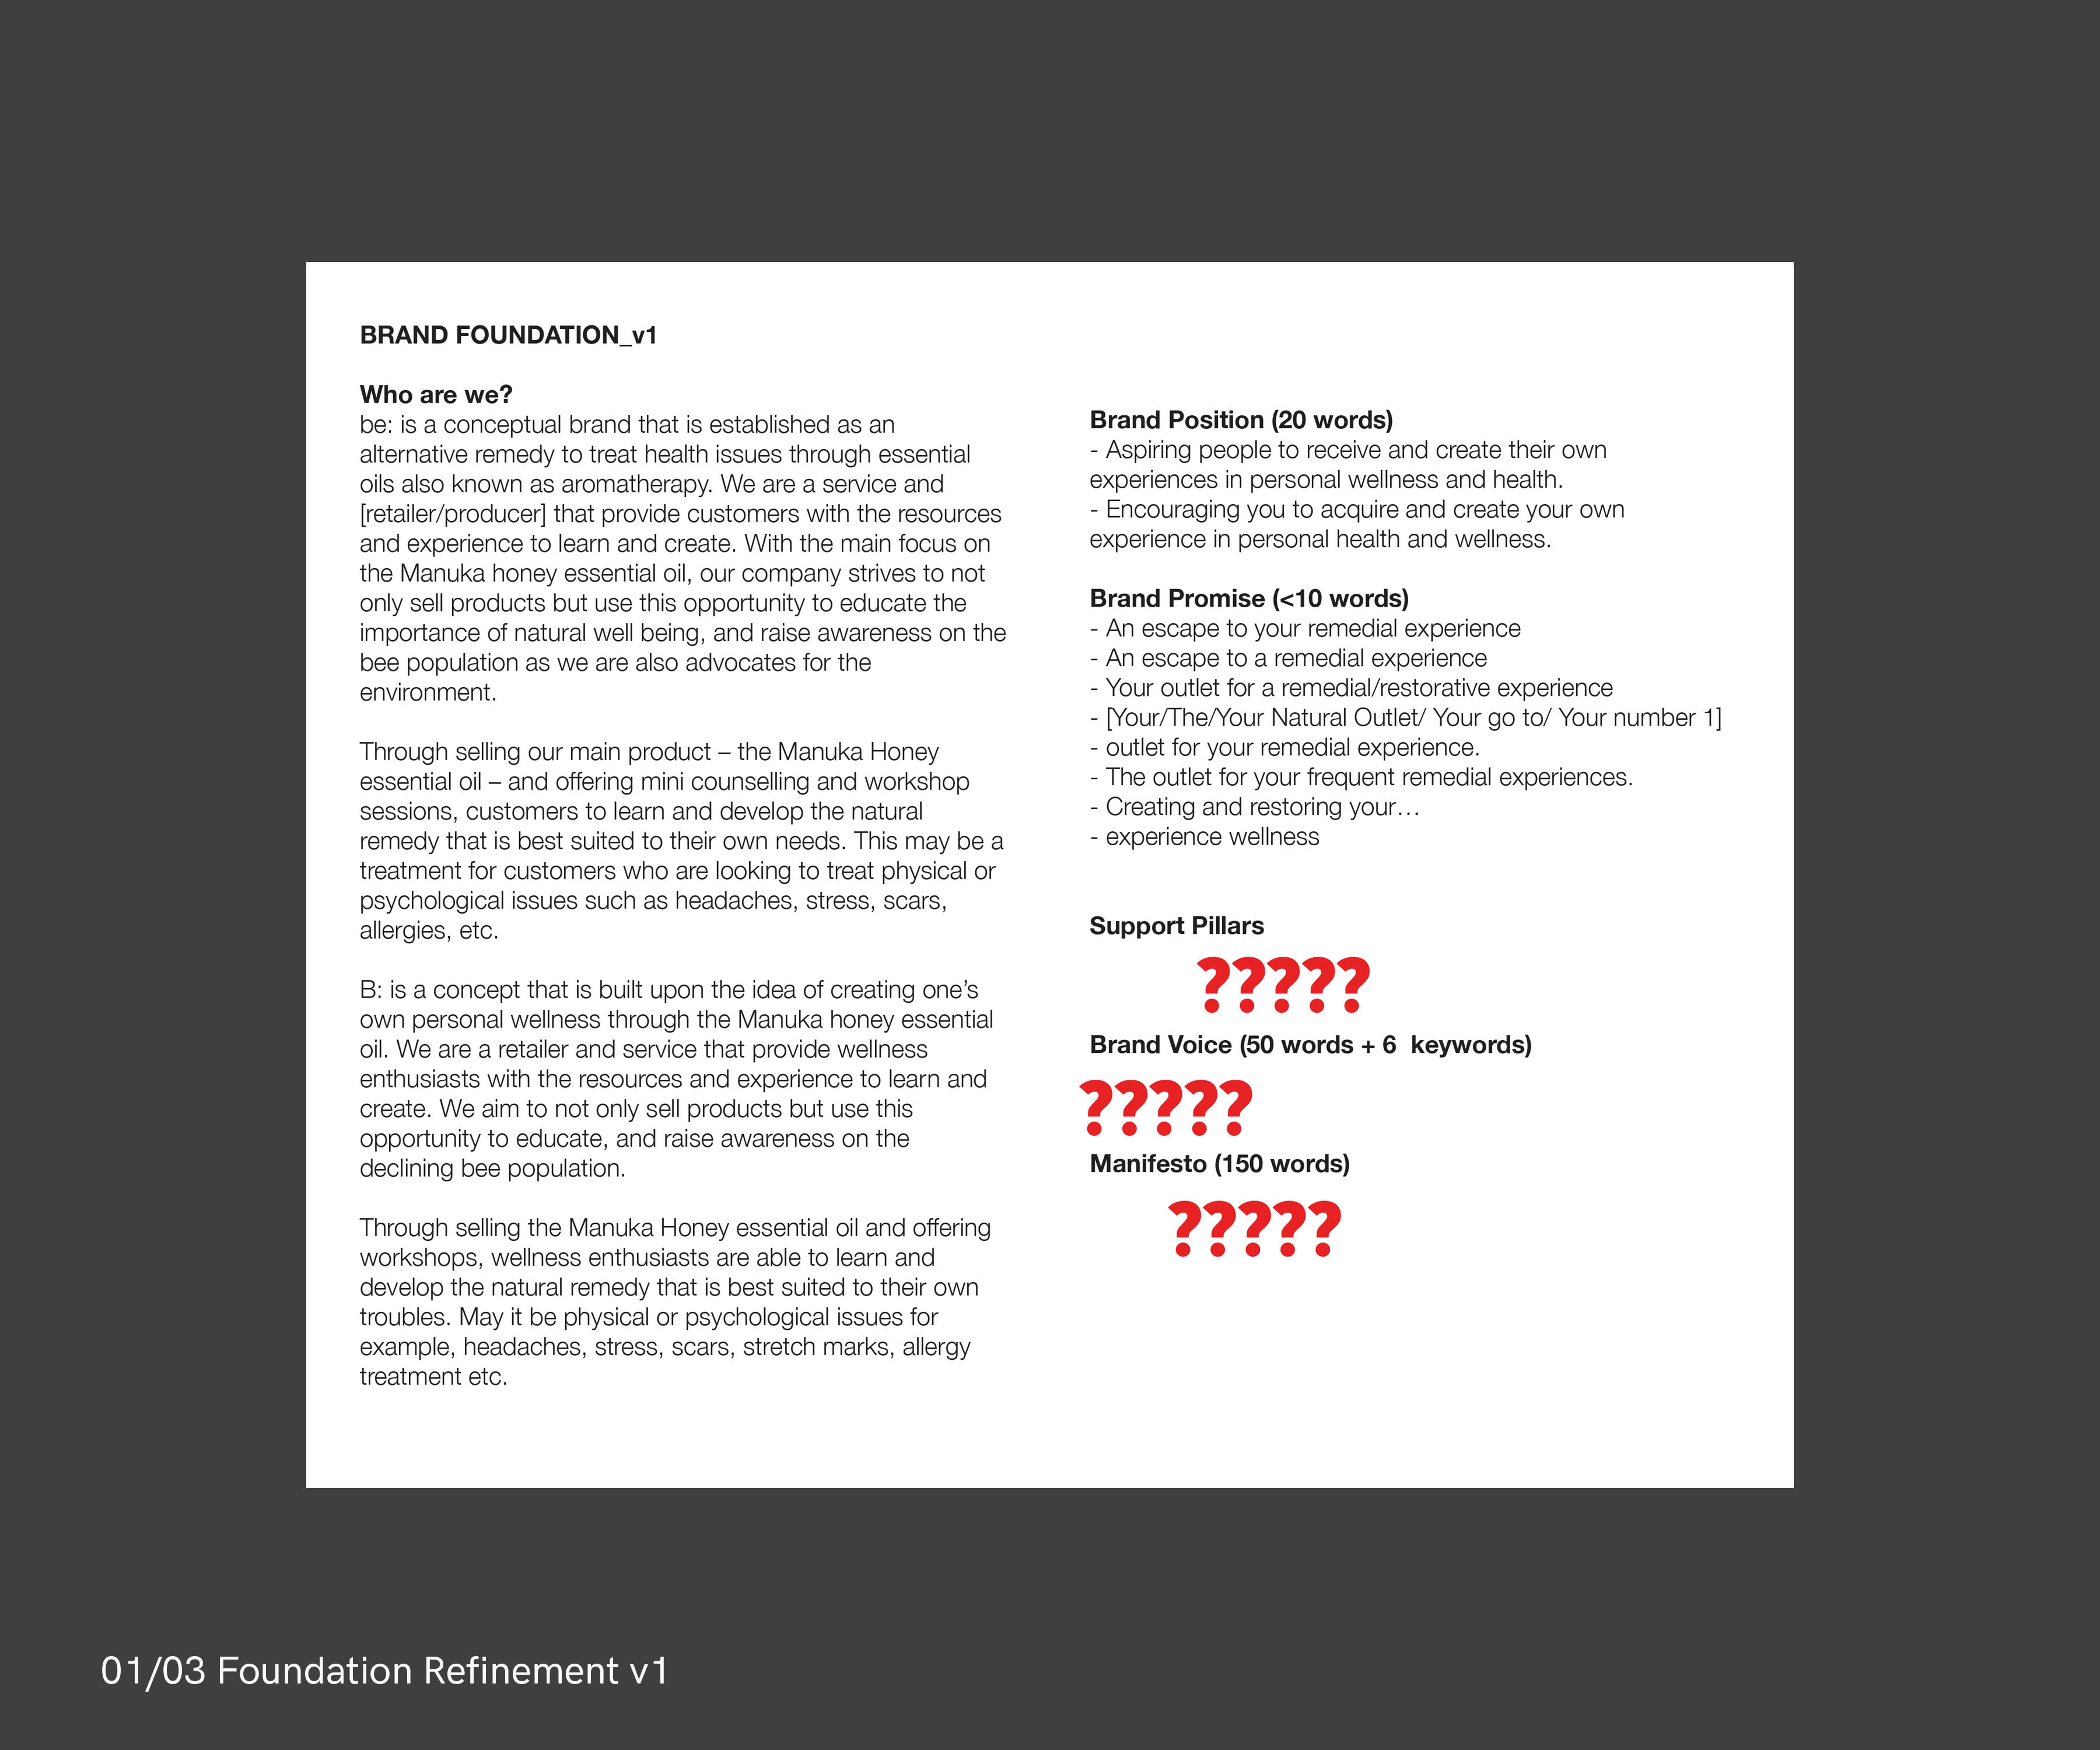 b_process_refinement-1.1